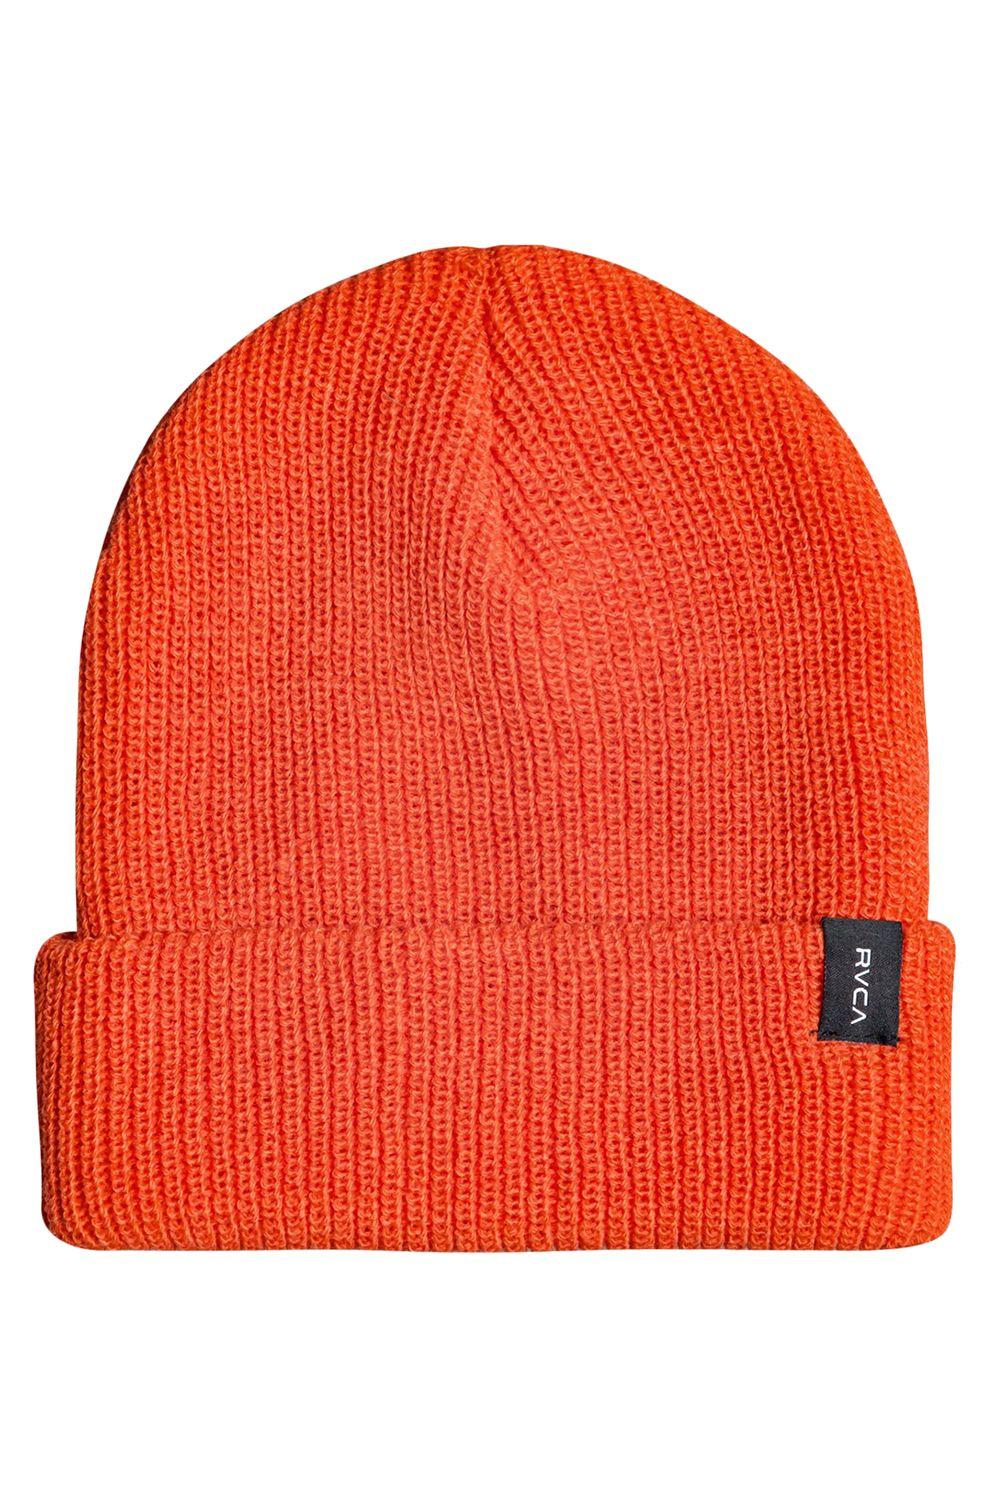 Gorro RVCA DAYSHIFT BEANIE III Orange